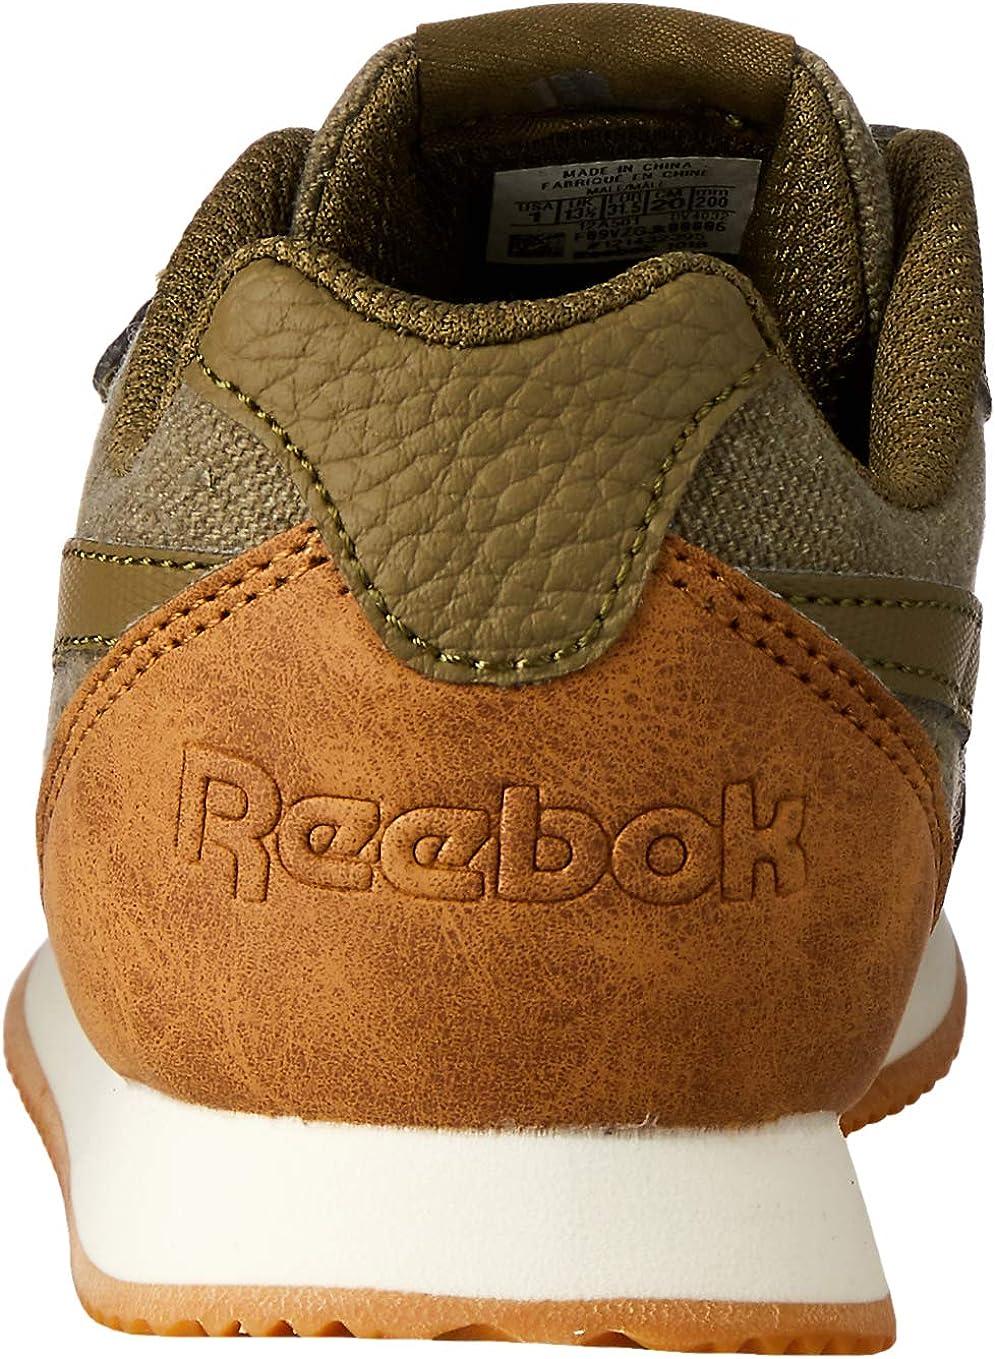 Reebok Royal Cljog 2 2v Chaussures de Trail gar/çon